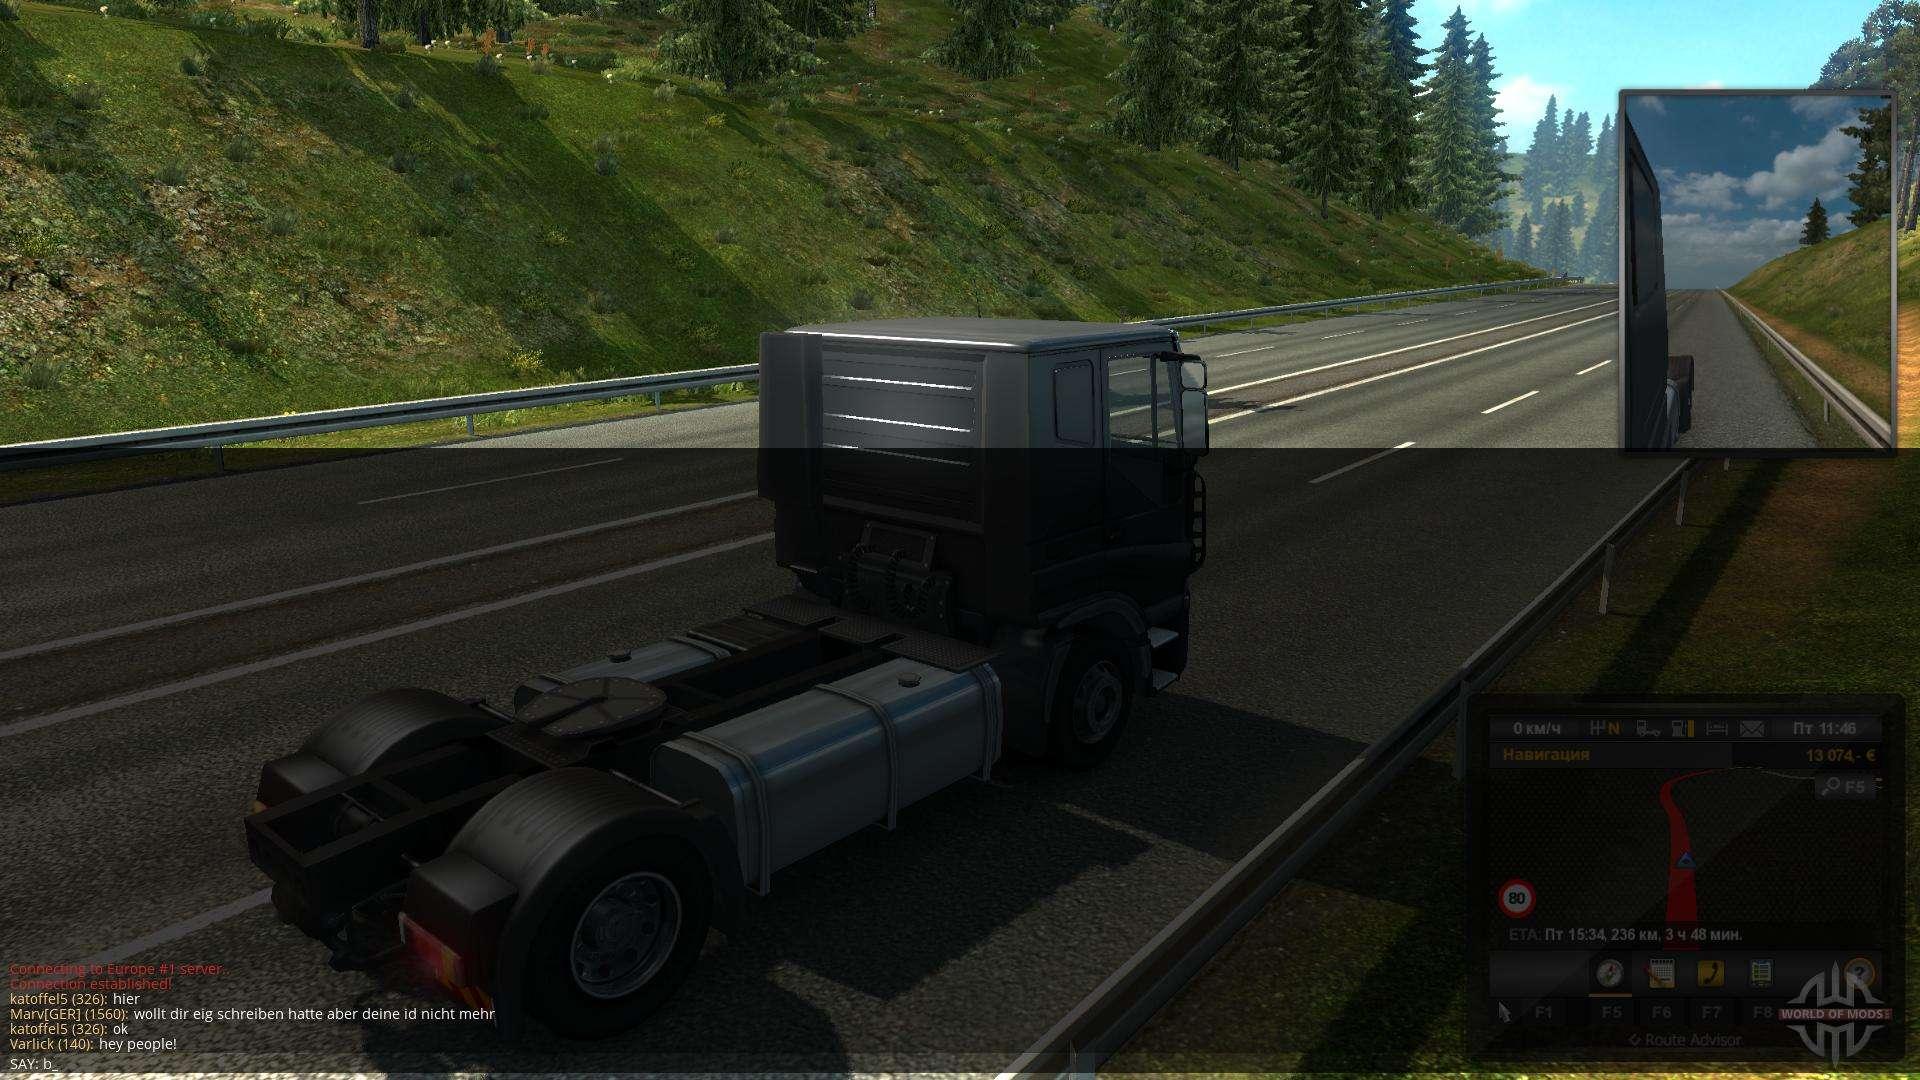 Como jogar Euro Truck Simulator 2 on-line - ETS 2 multiplayer